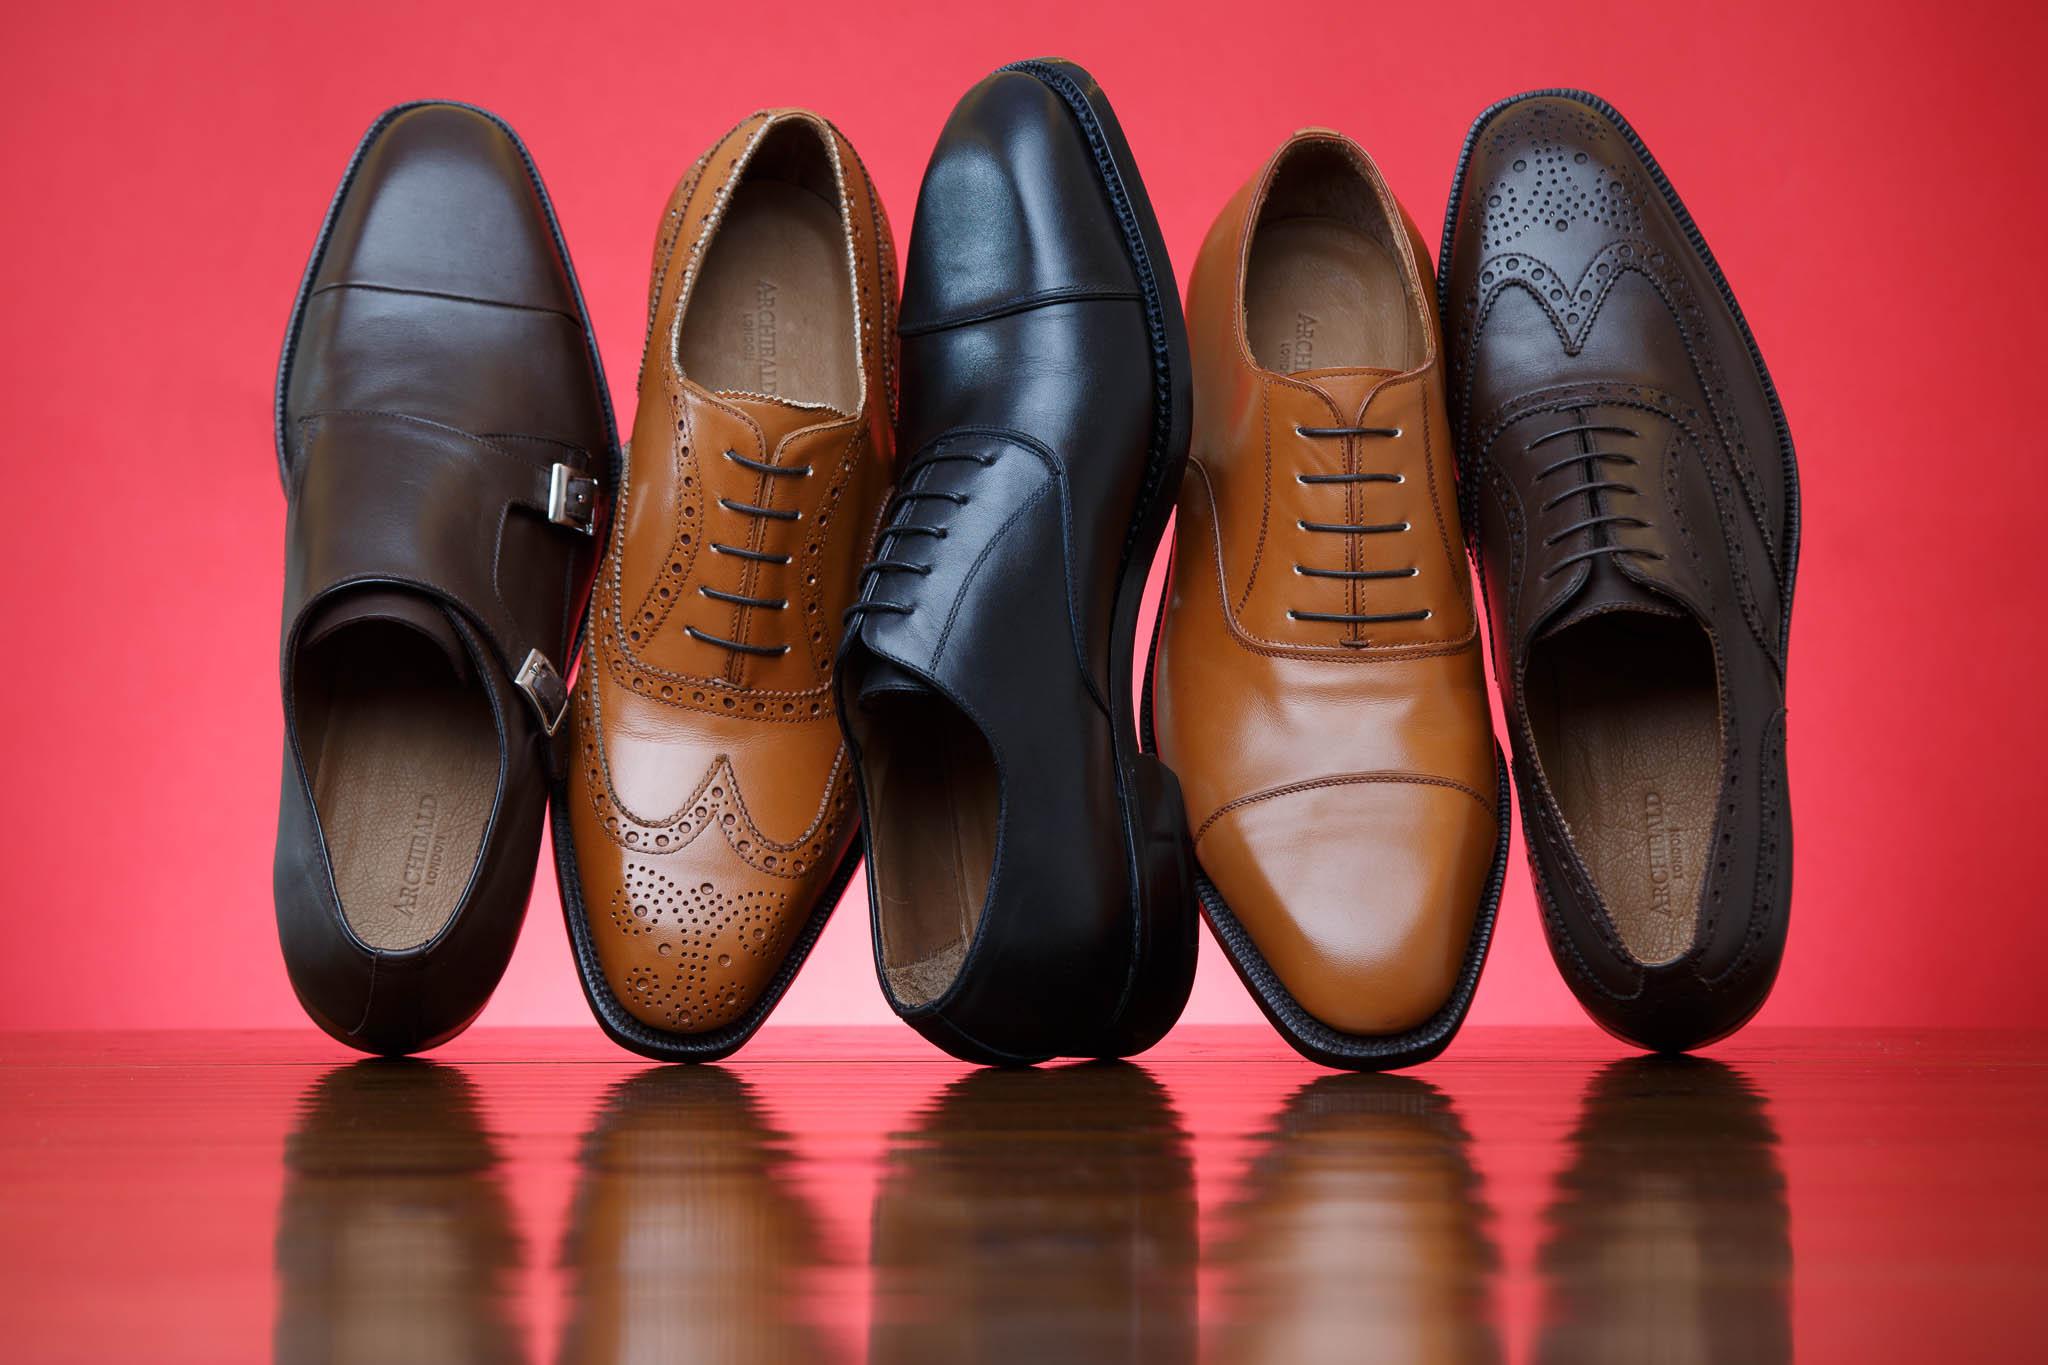 170729_Archibald_Shoes_019.jpg